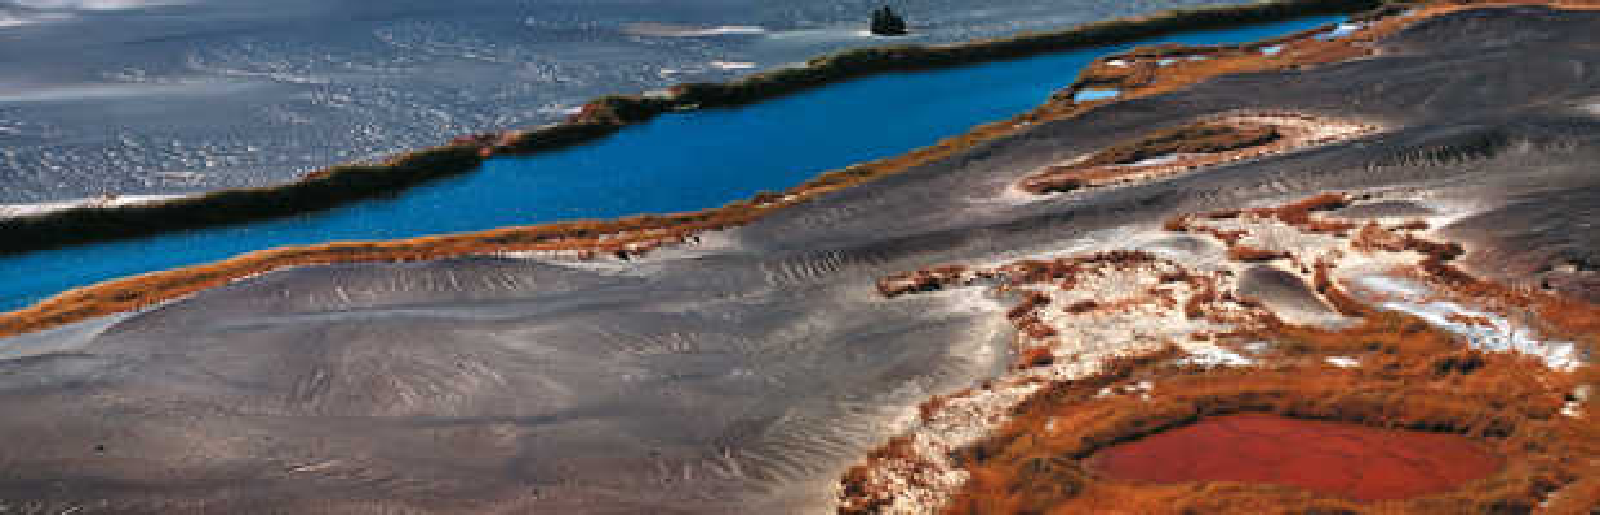 Wau an Namus, Red Lake / Libya - Hans Gasser